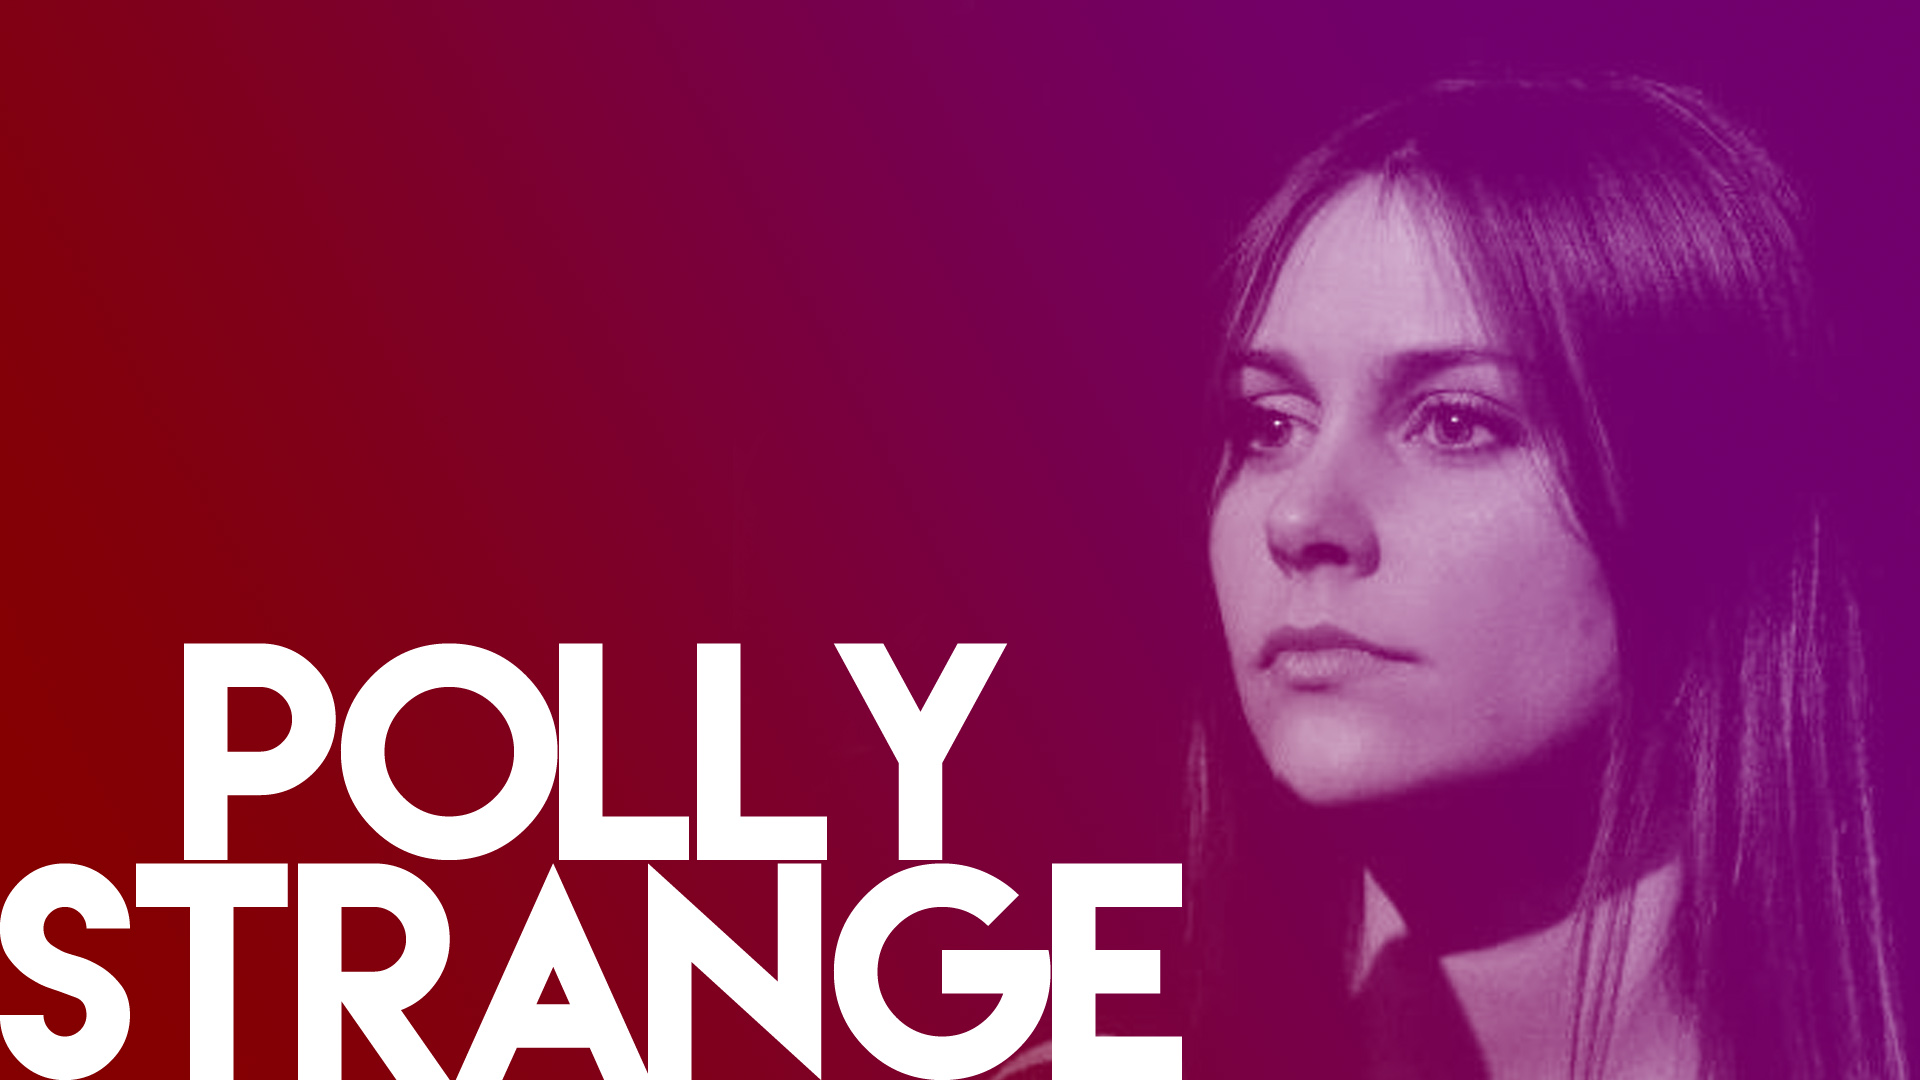 polly strange 2